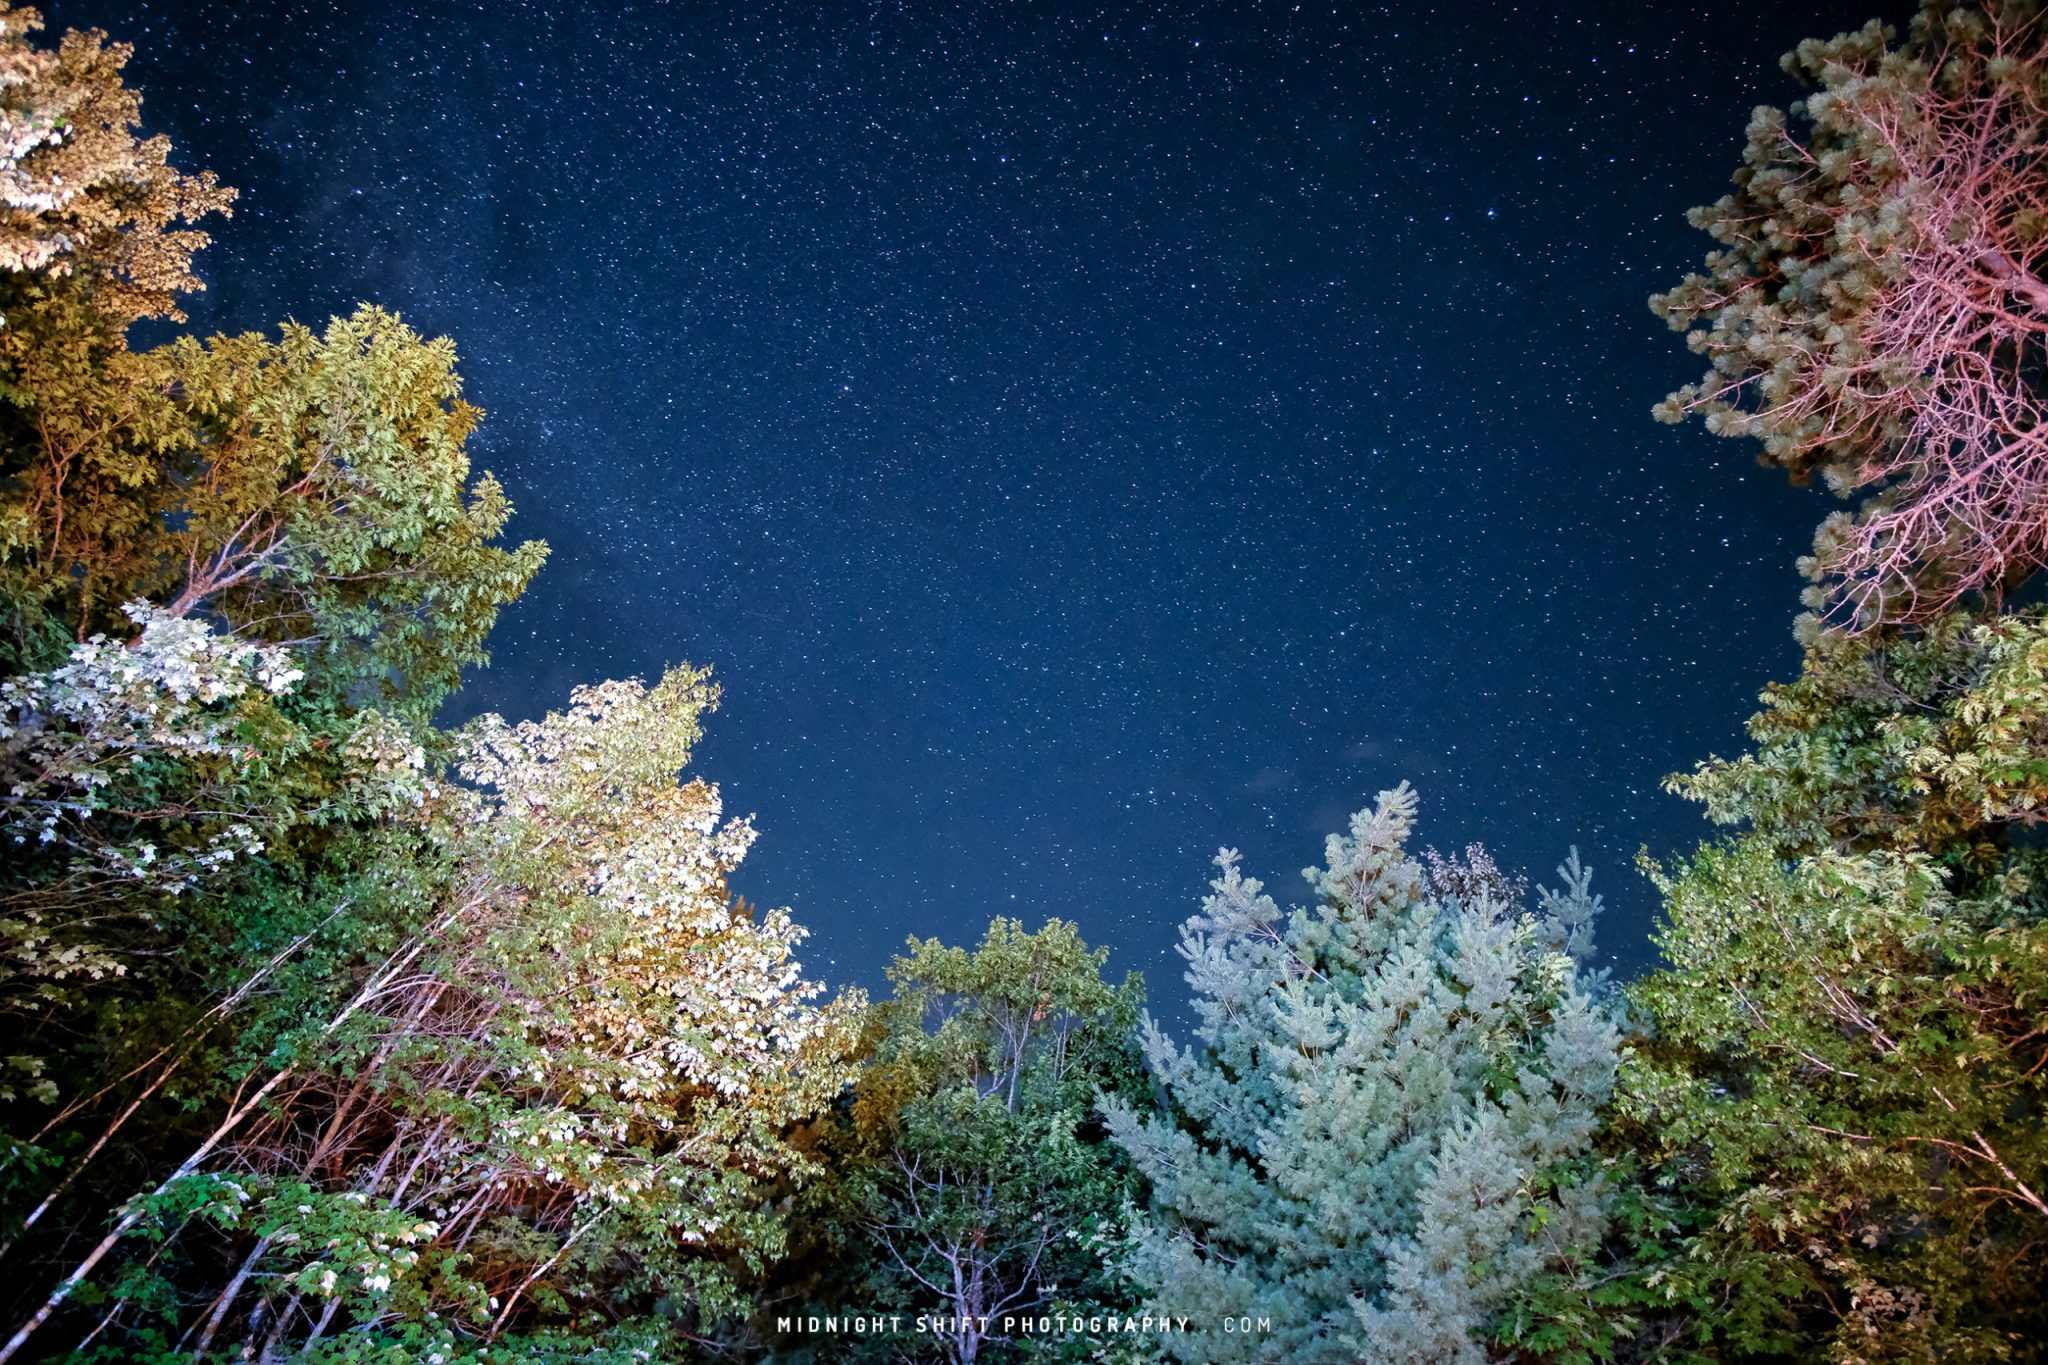 Milkyway Galaxy over Maine 2018